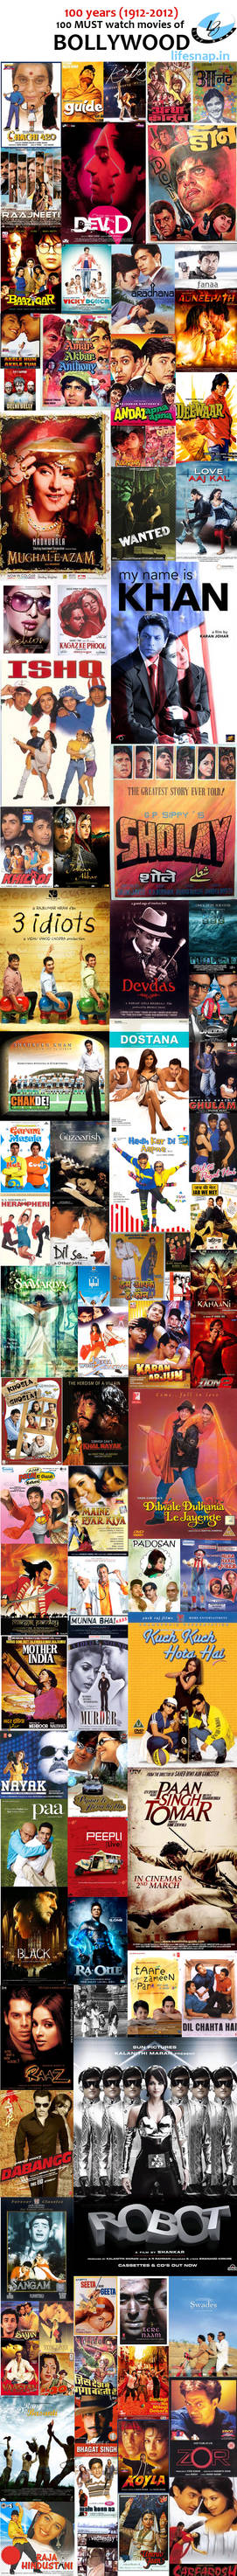 100 Bollywood Movie